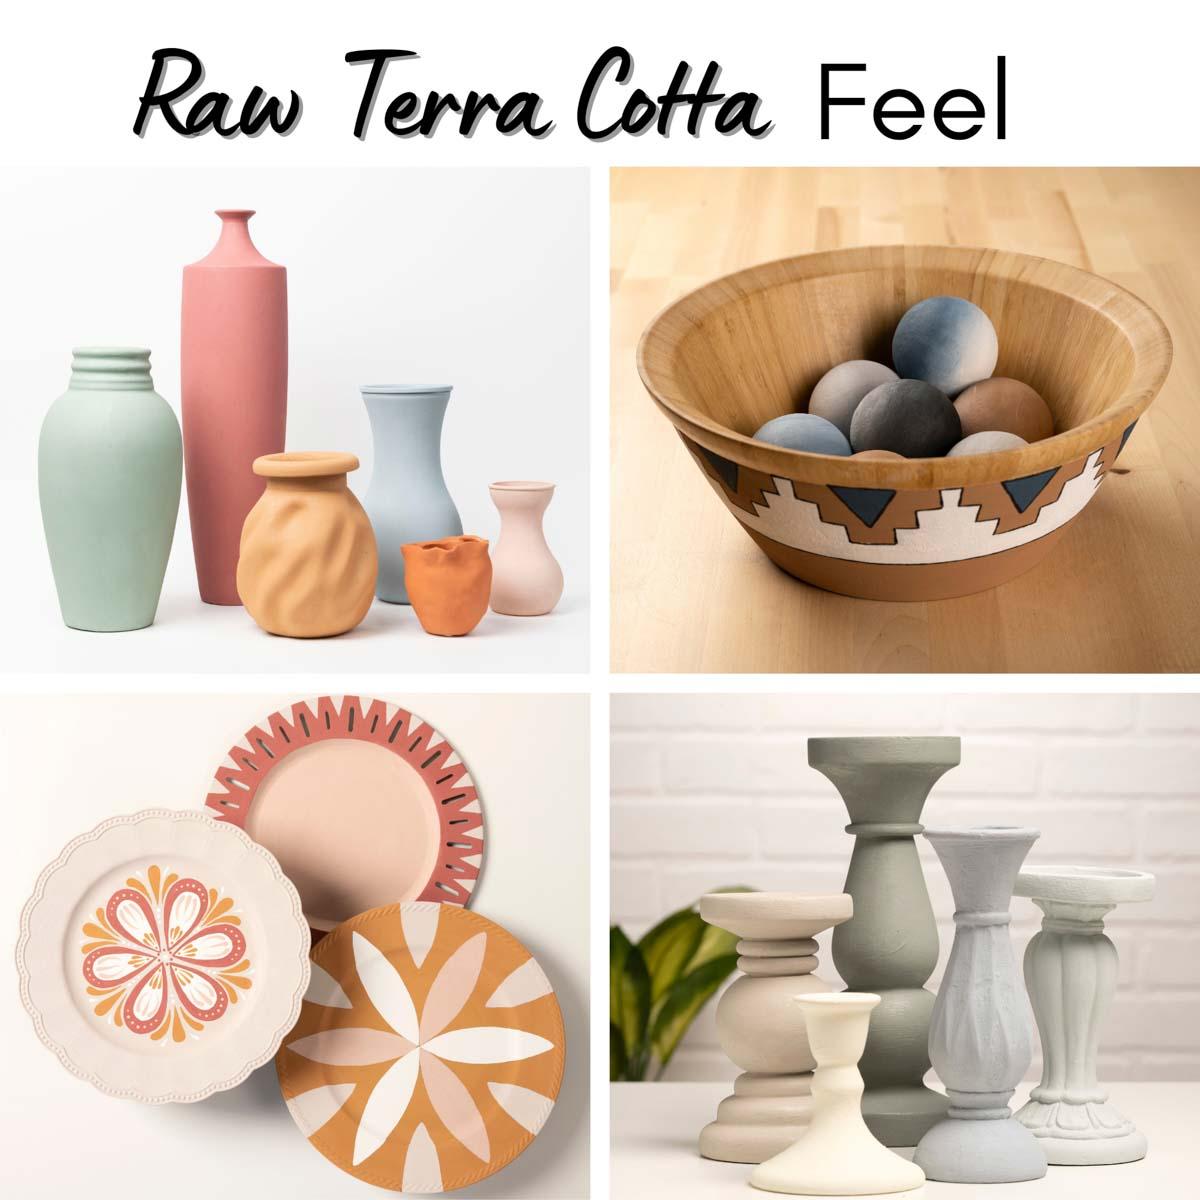 FolkArt ® Terra Cotta™ Acrylic Paint - Pueblo, 2 oz. - 7018